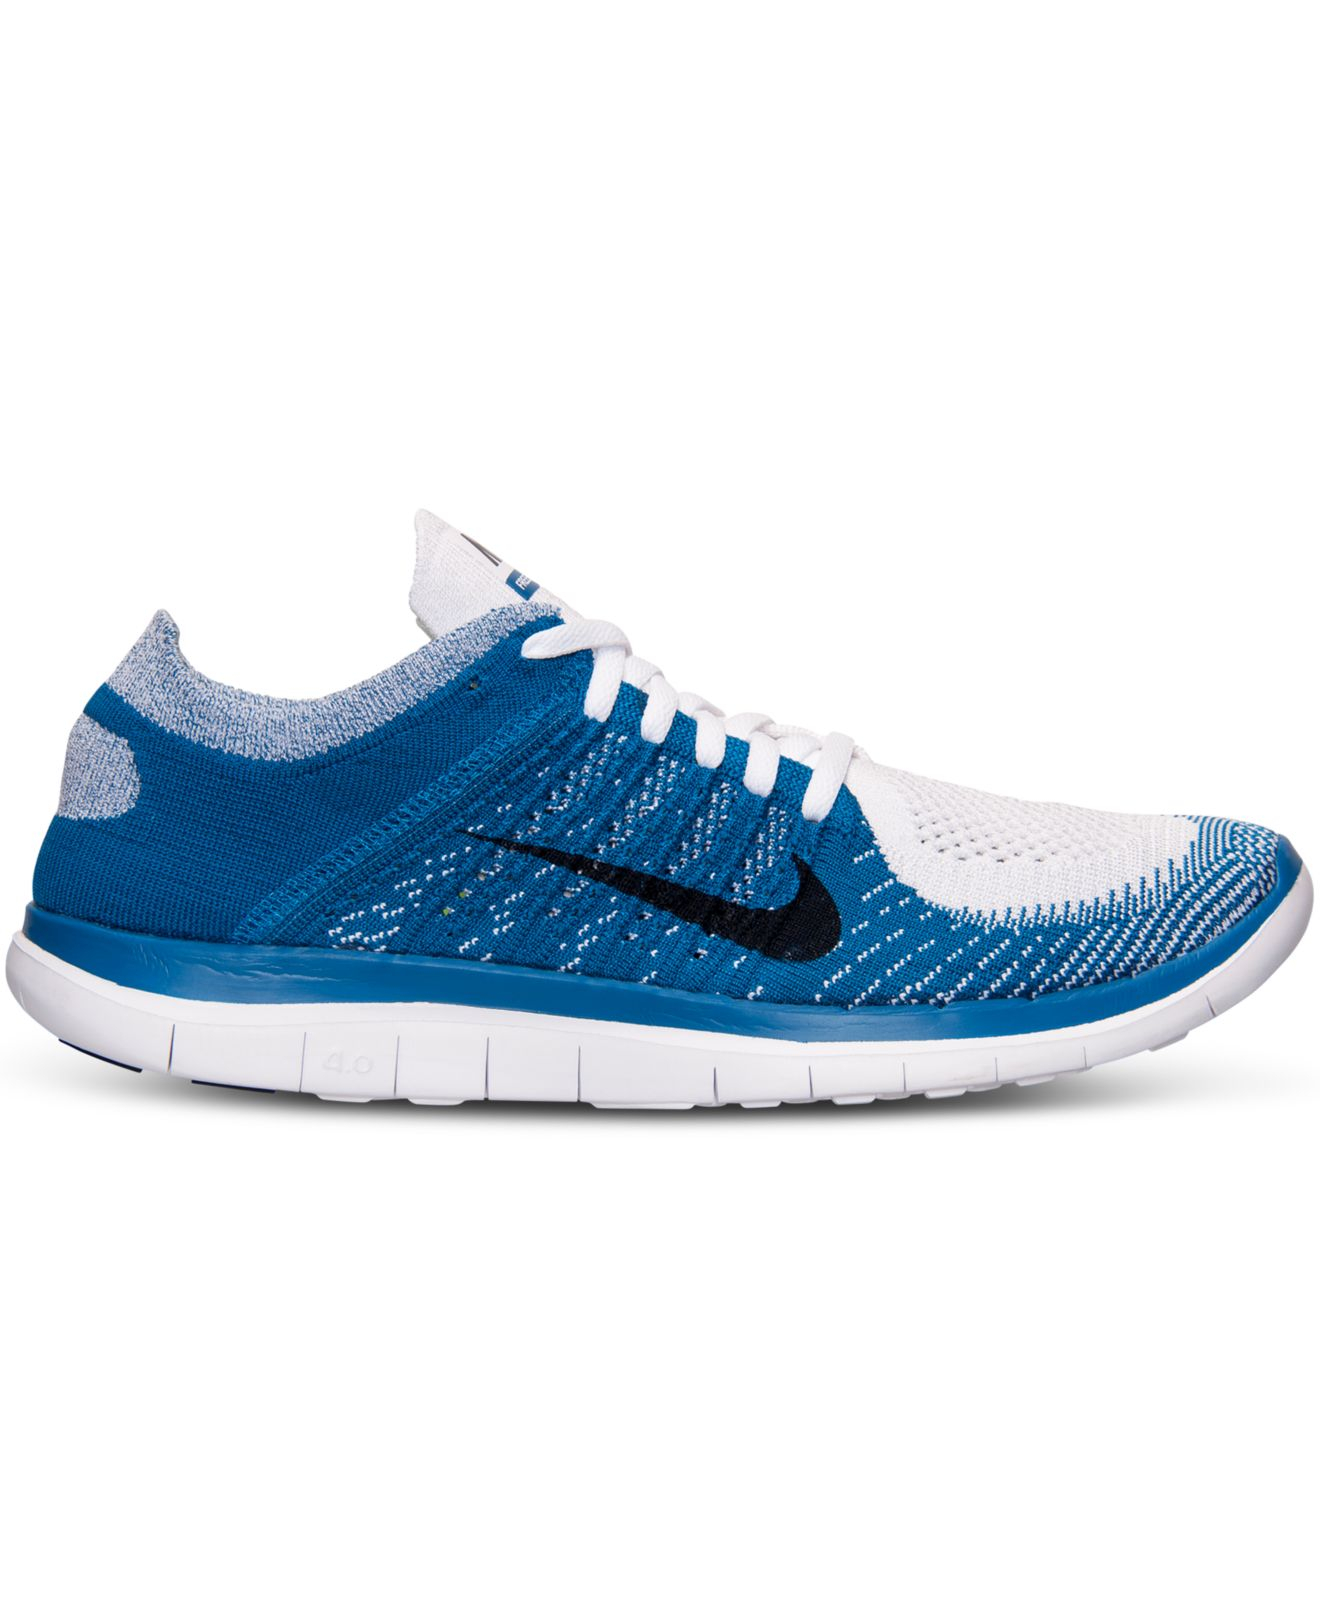 ea21f3a732fad Nike - Blue Men S Free Flyknit 4.0 Running Sneakers From Finish Line for Men  - Lyst